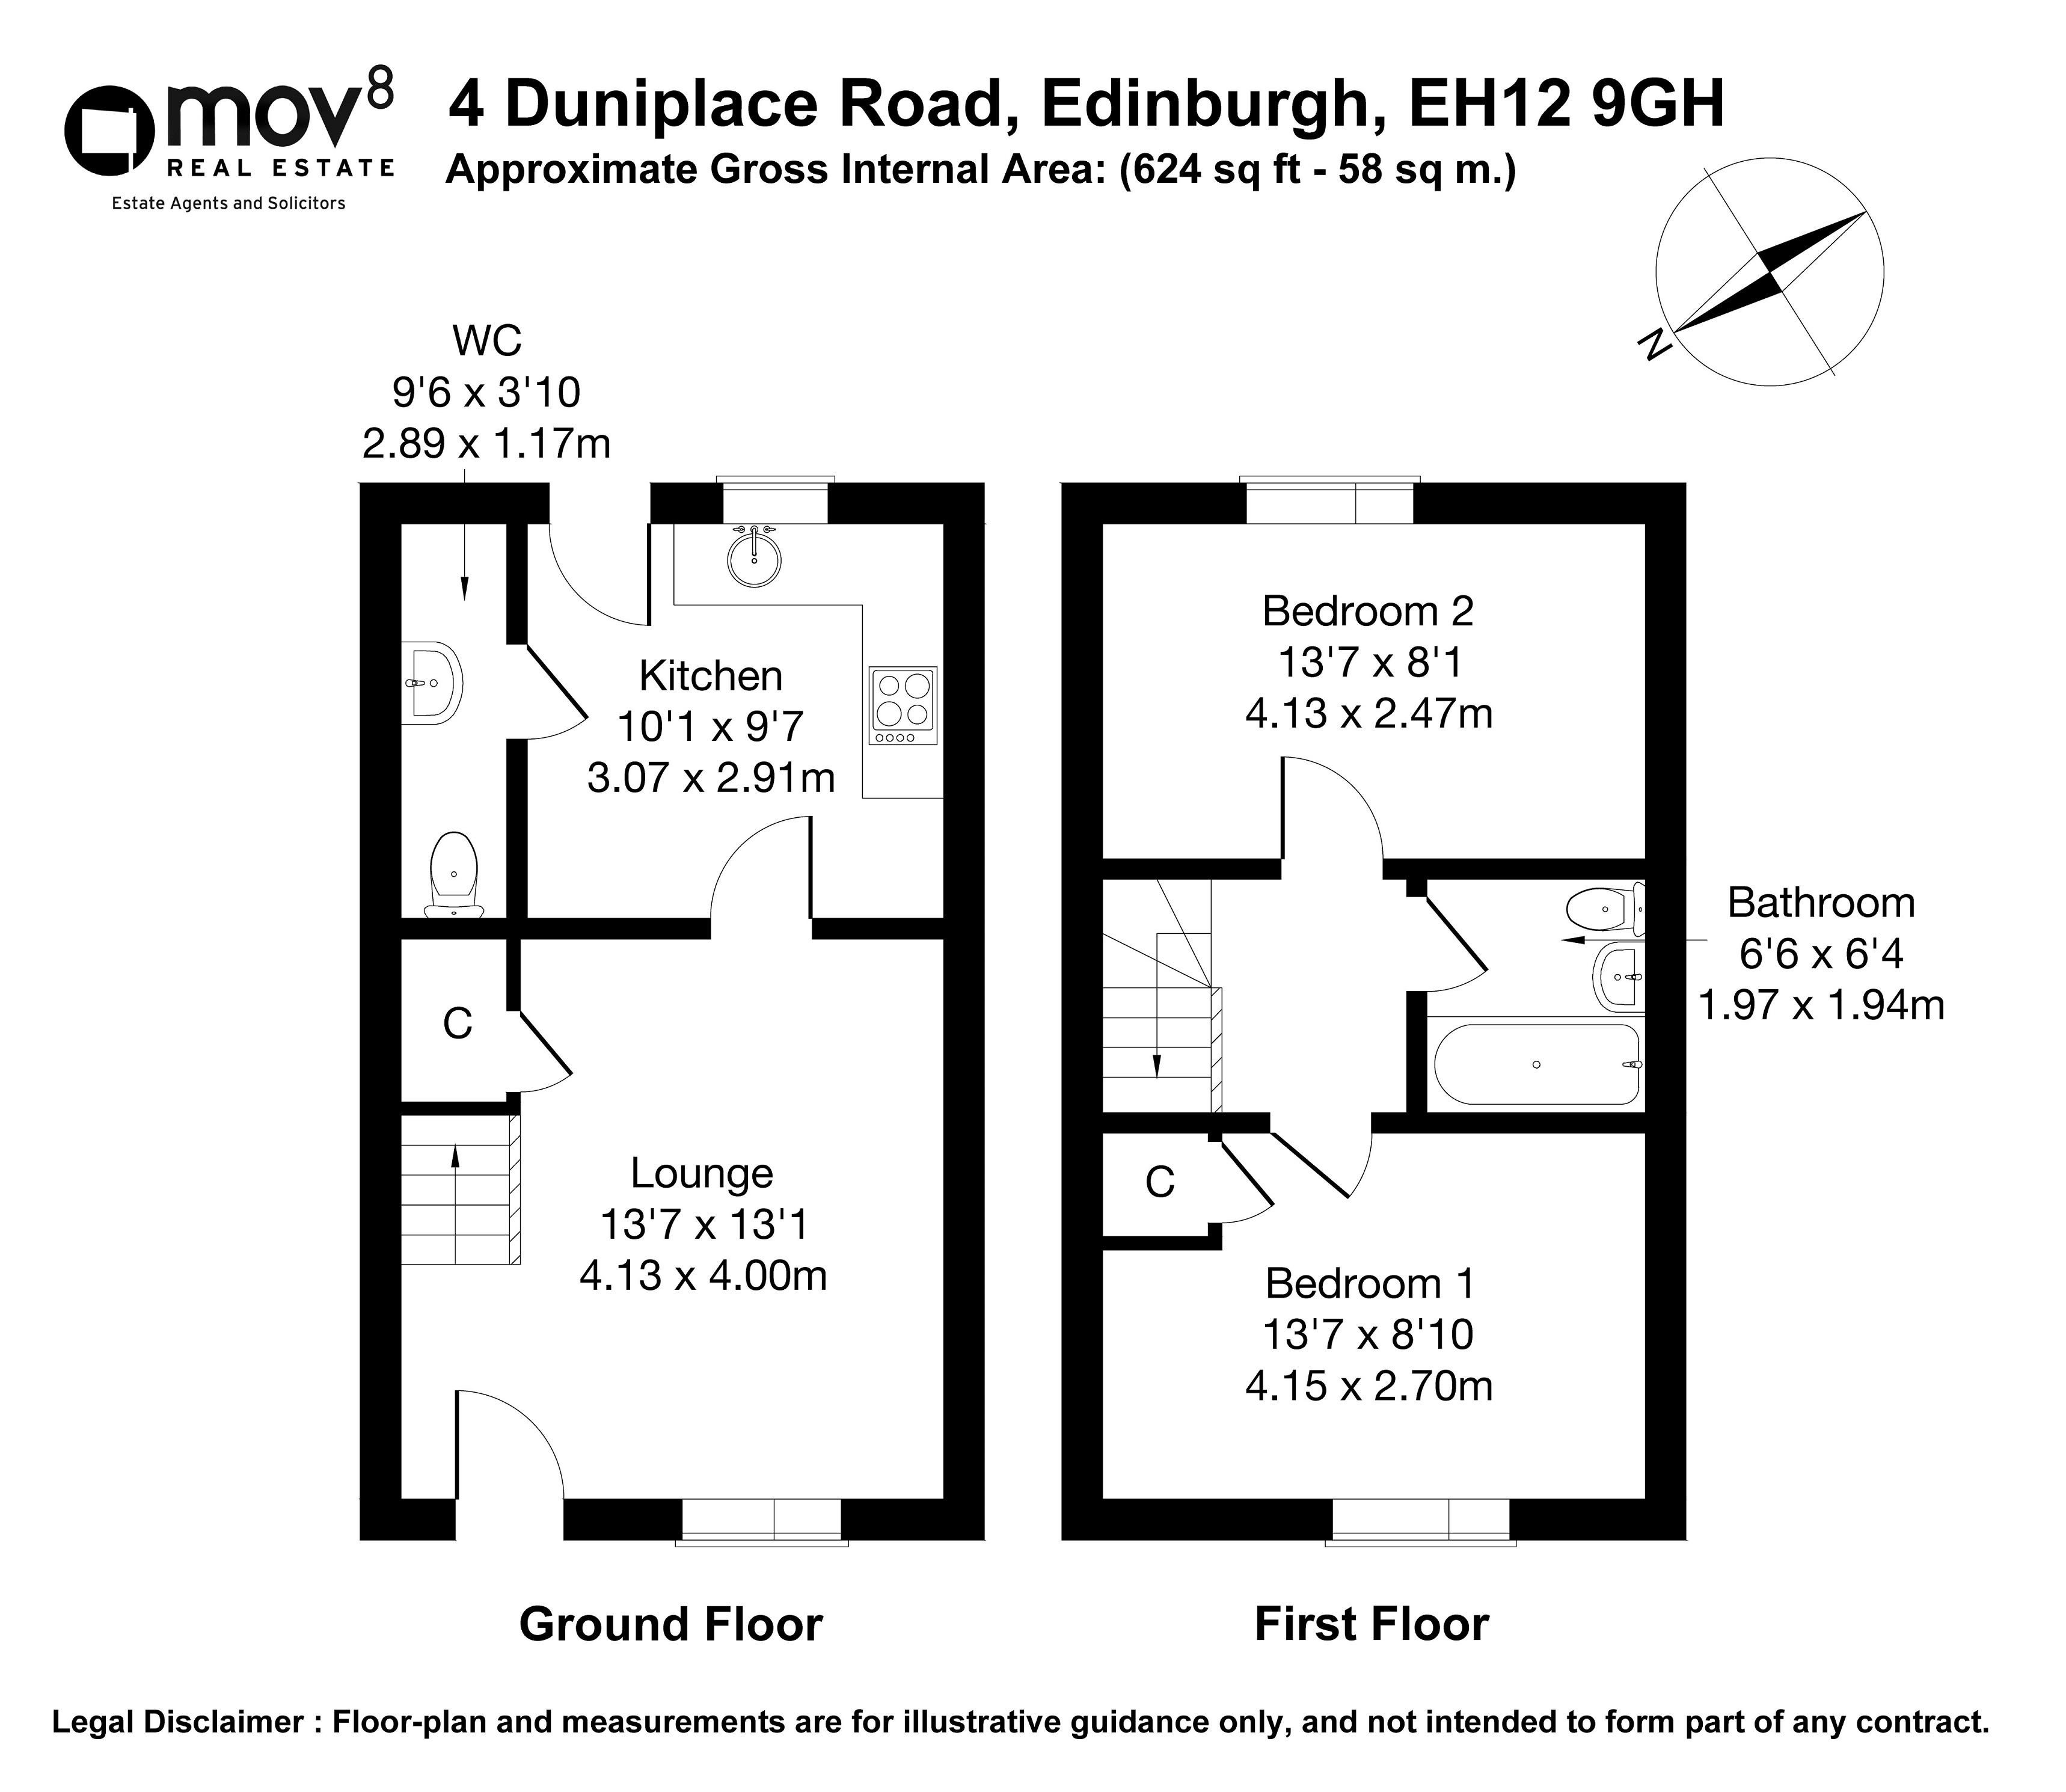 Floorplan 1 of 4 Dunipace Road, South Gyle, Edinburgh, EH12 9GH